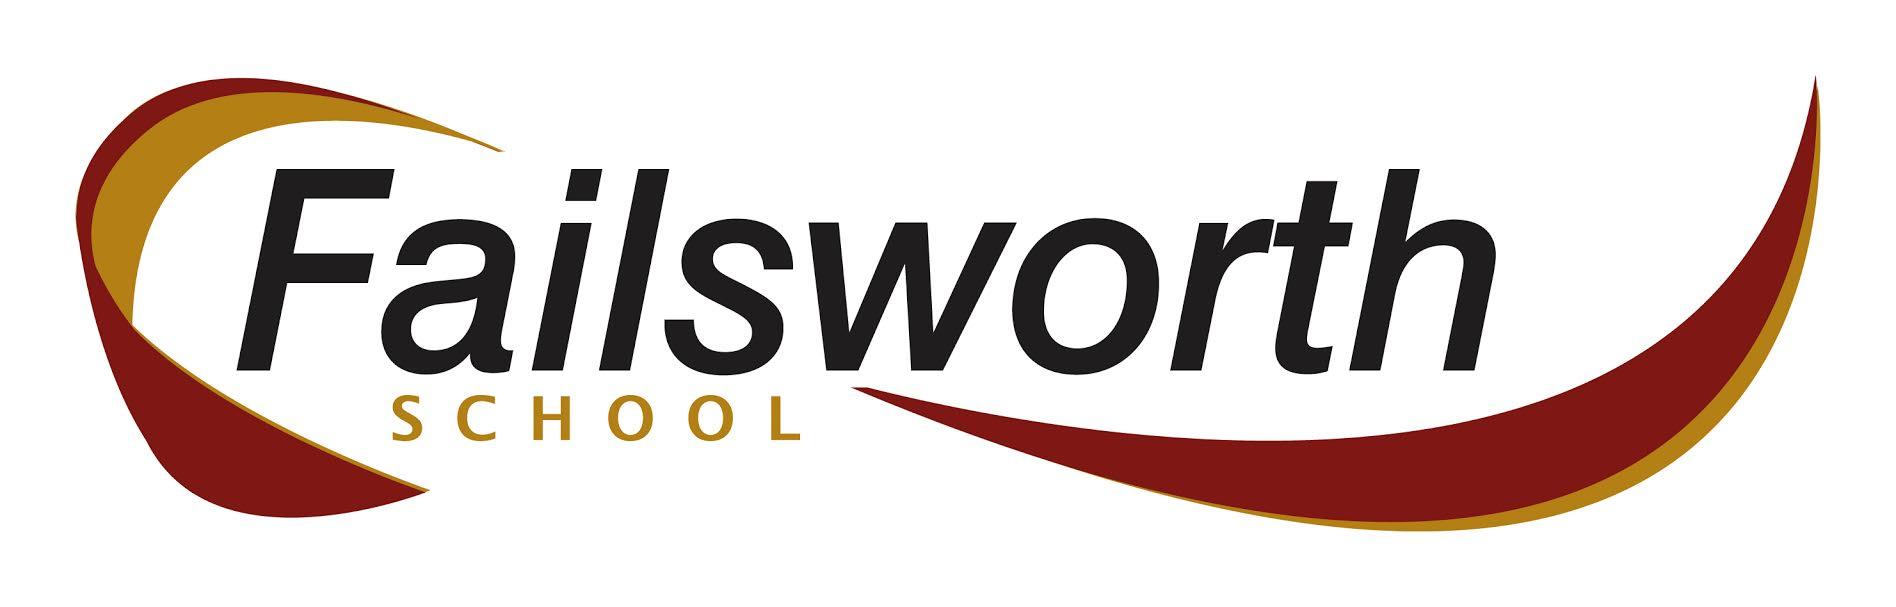 Failsworth School